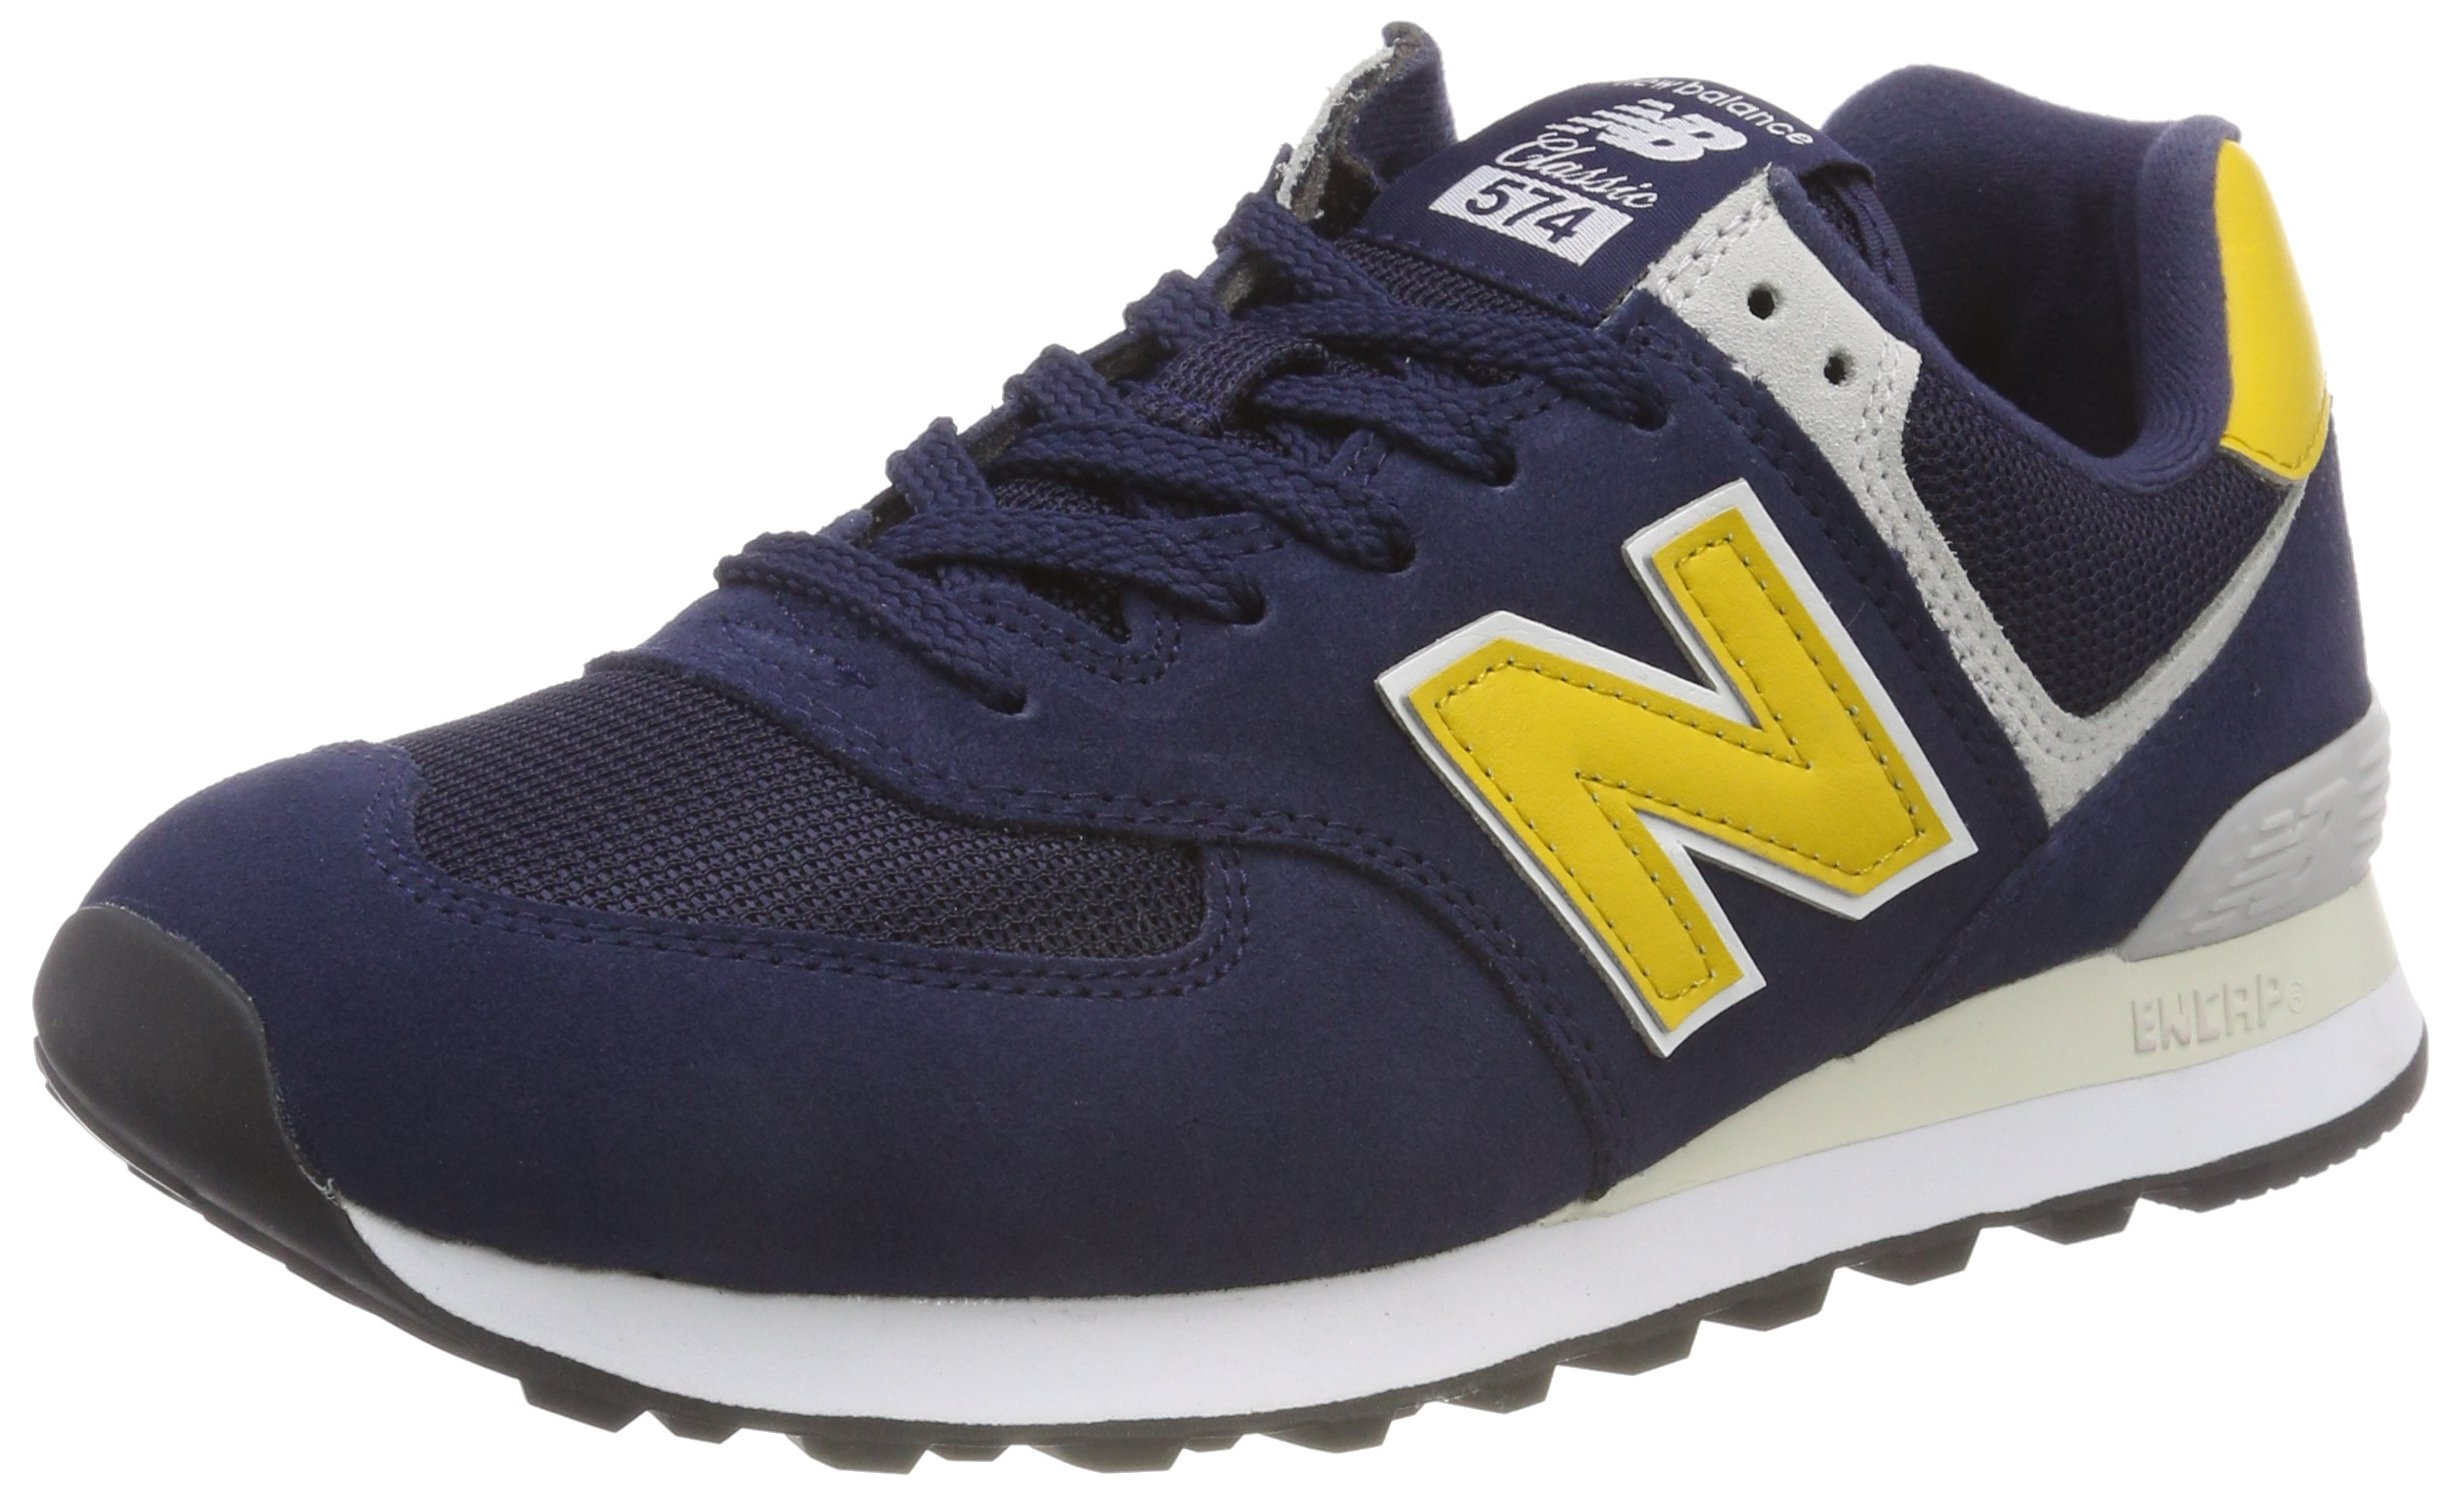 New Balance Men's 574v2 Sneaker, Pigment, 11.5 D US